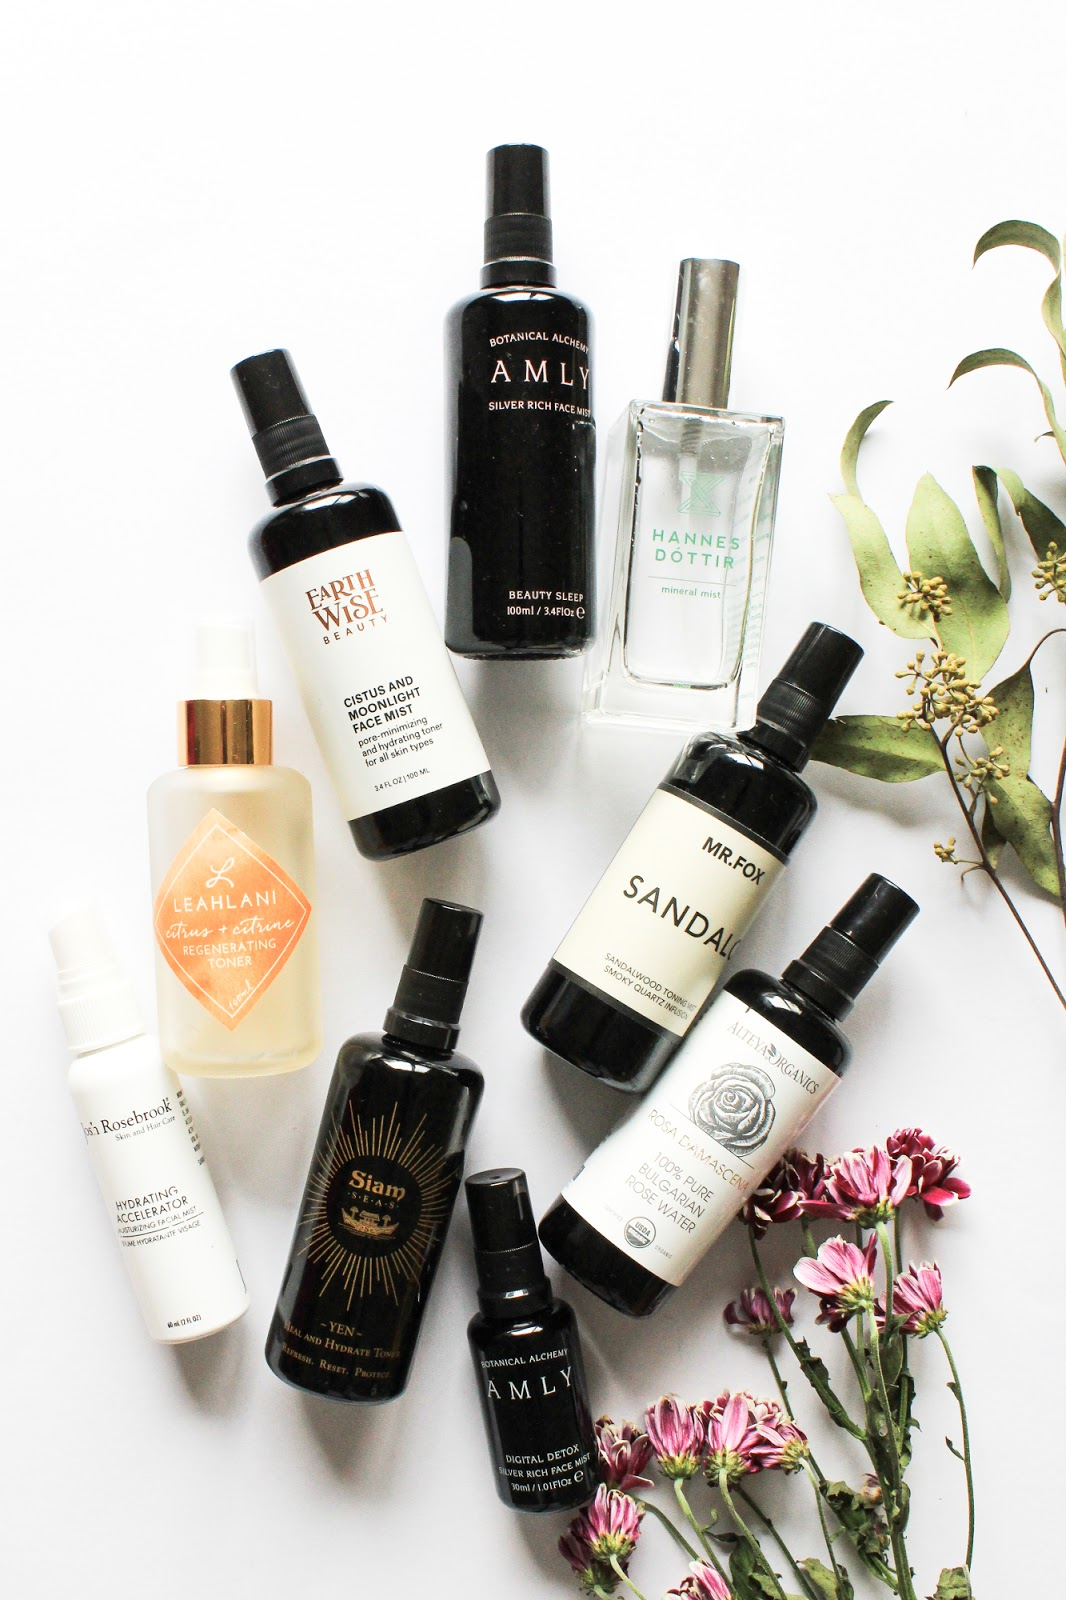 Organic natural face mists toners. Amly Botanicals, Sias Seas, Leahlani, Lilfox, Alteya Organics, Earthwise Beauty